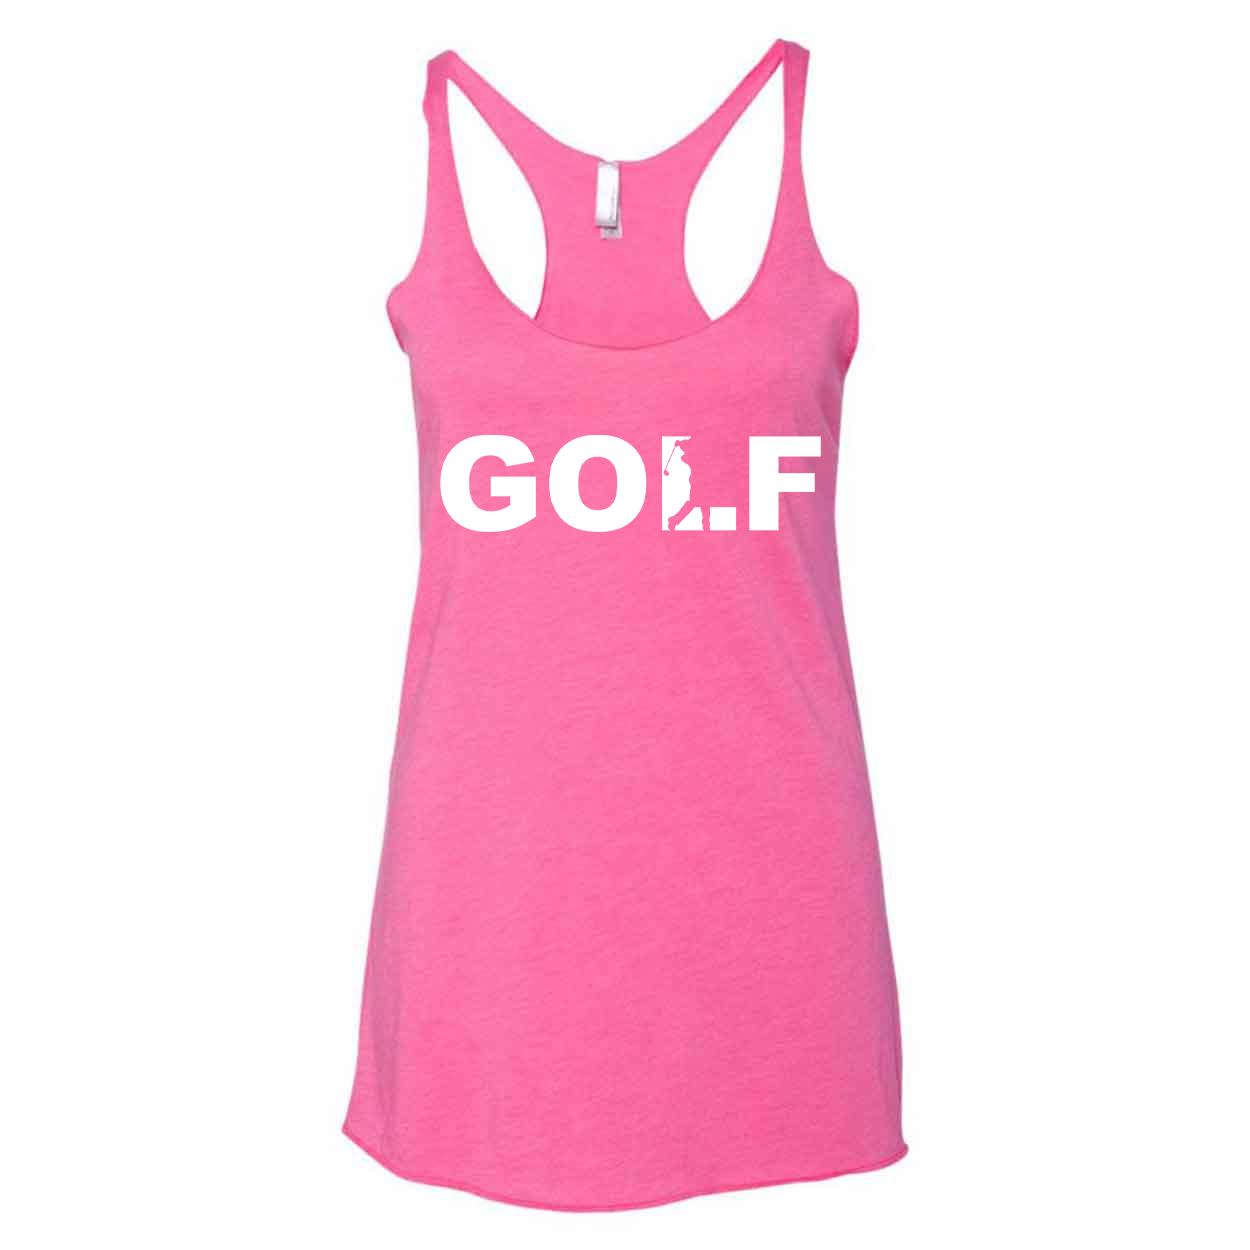 Golf Swing Logo Classic Women's Ultra Thin Tank Top Vintage Pink (White Logo)